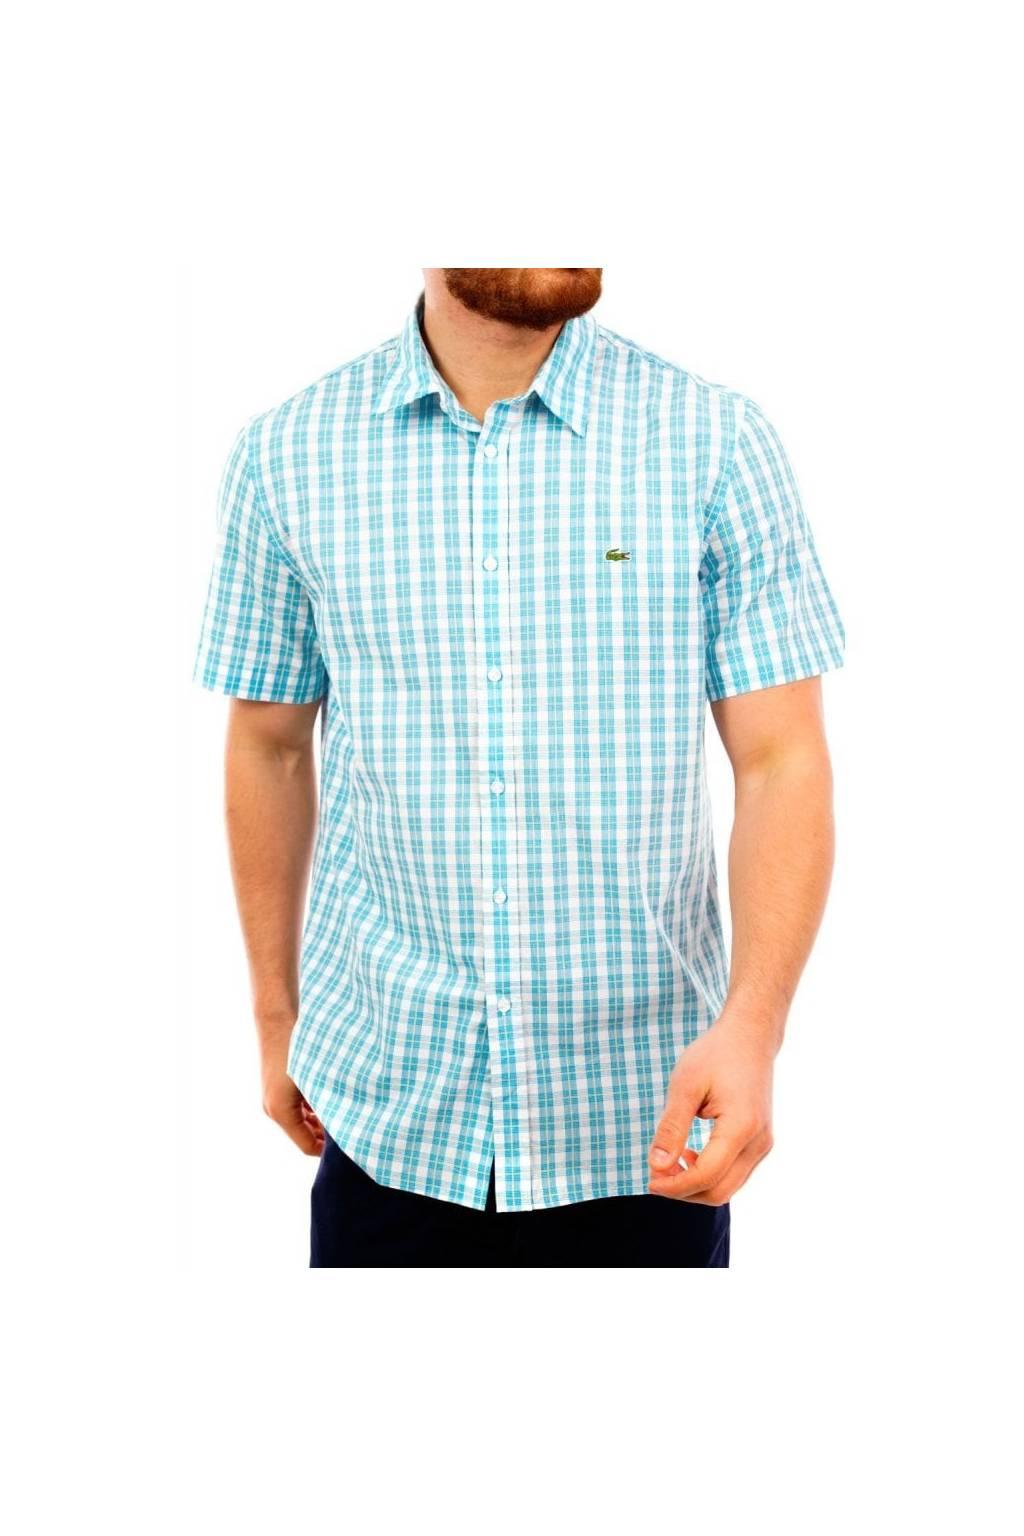 Camisa Lacoste ch8467 lzu